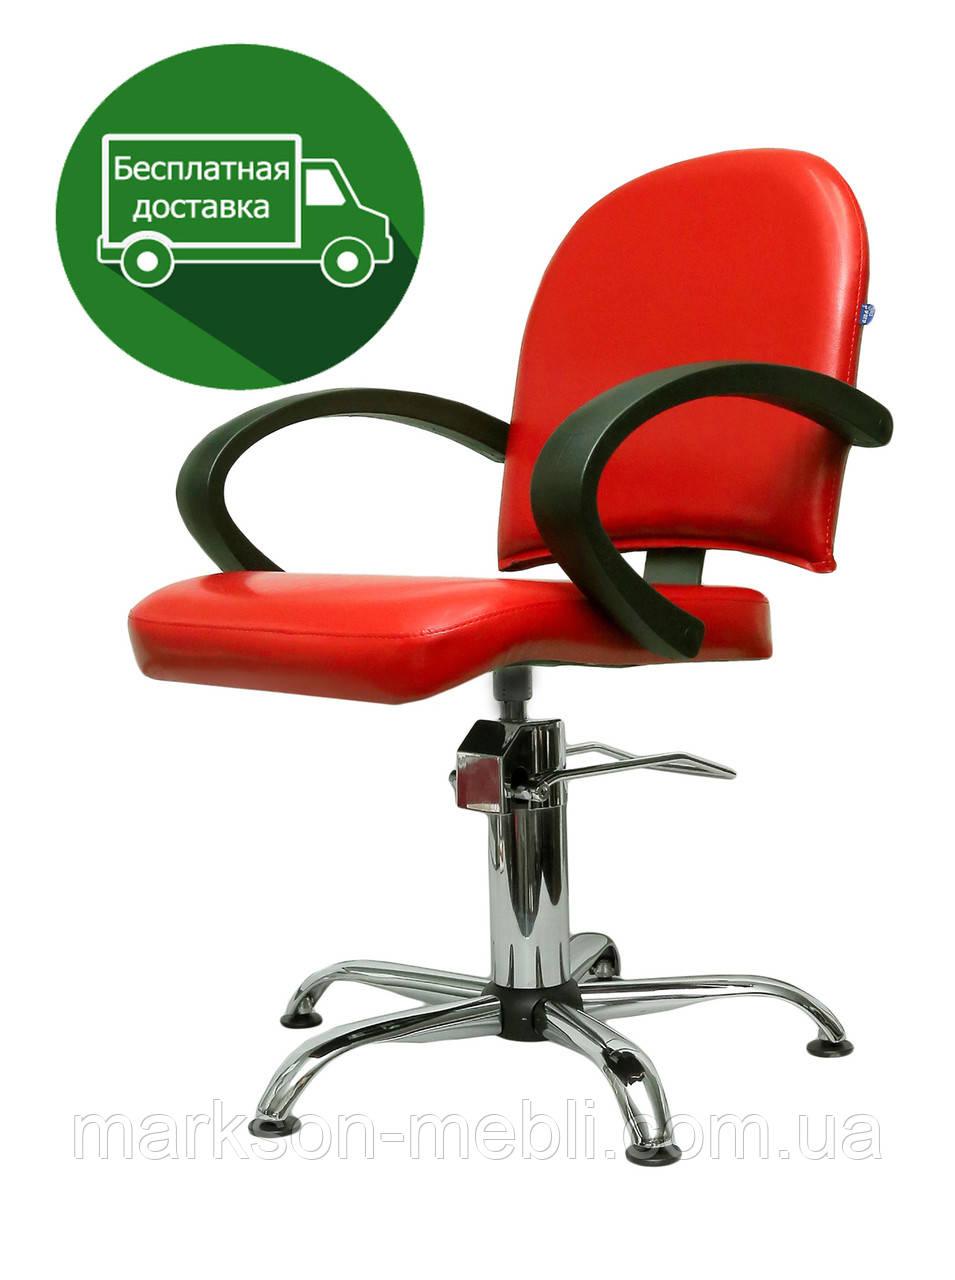 Кресло клиента на гидравлике ЛУНА